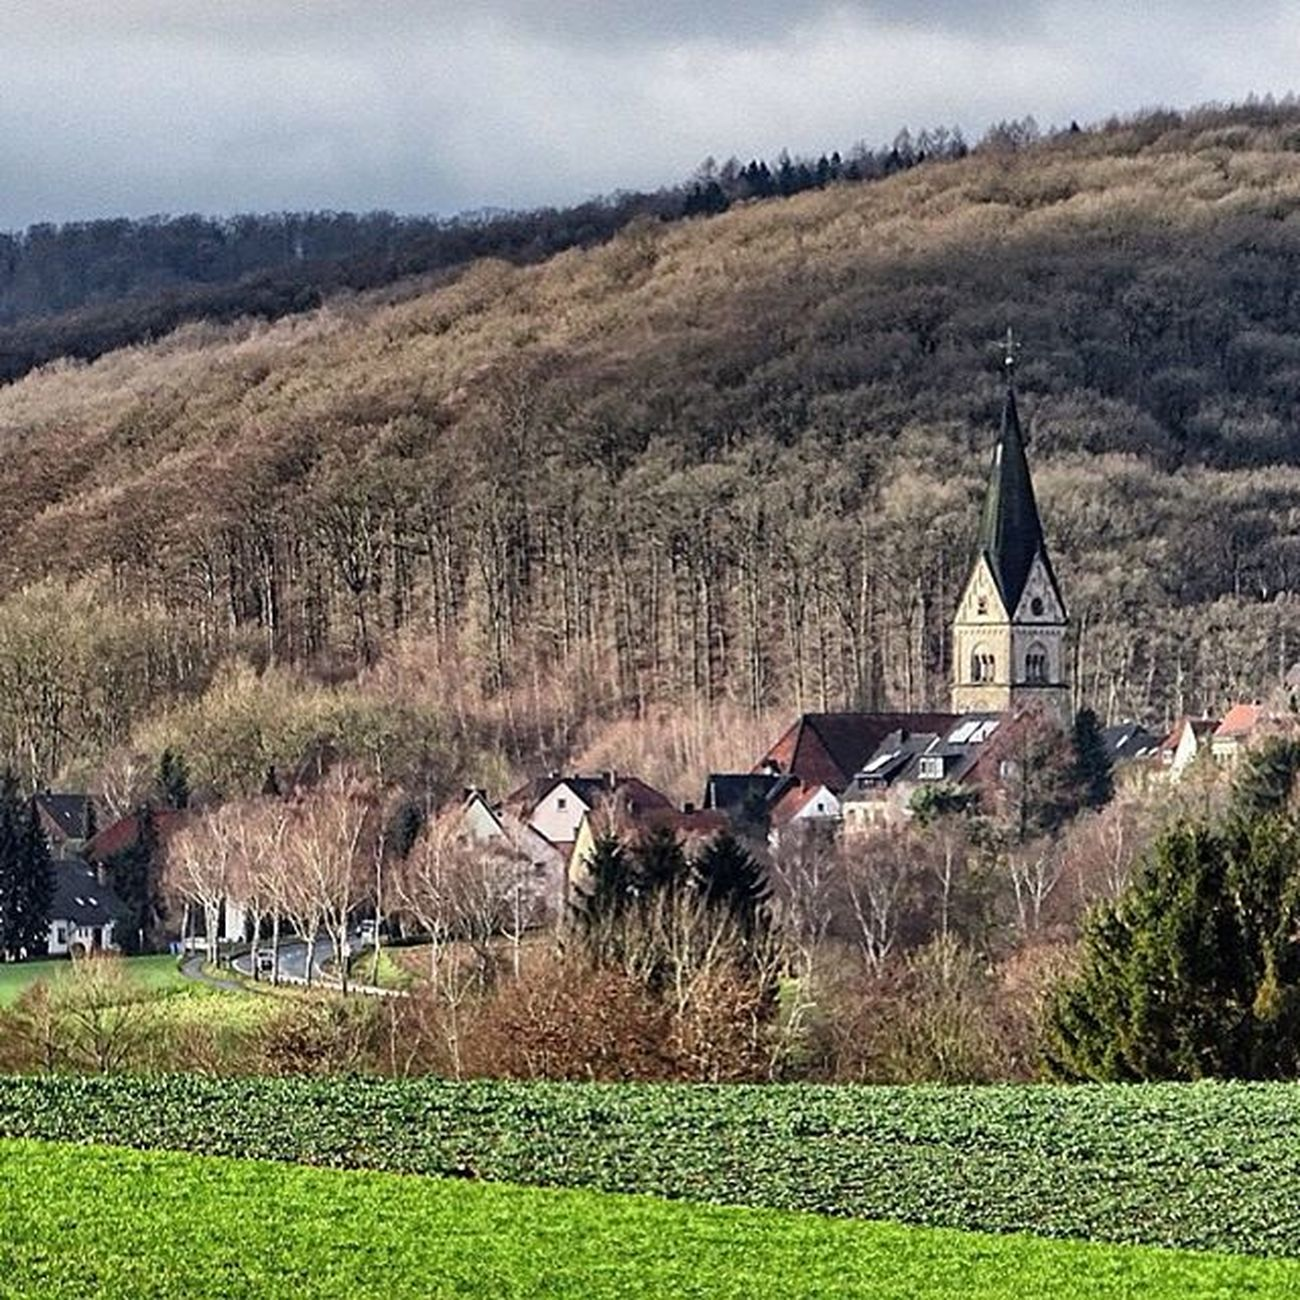 Salzdetfurth Detfurth